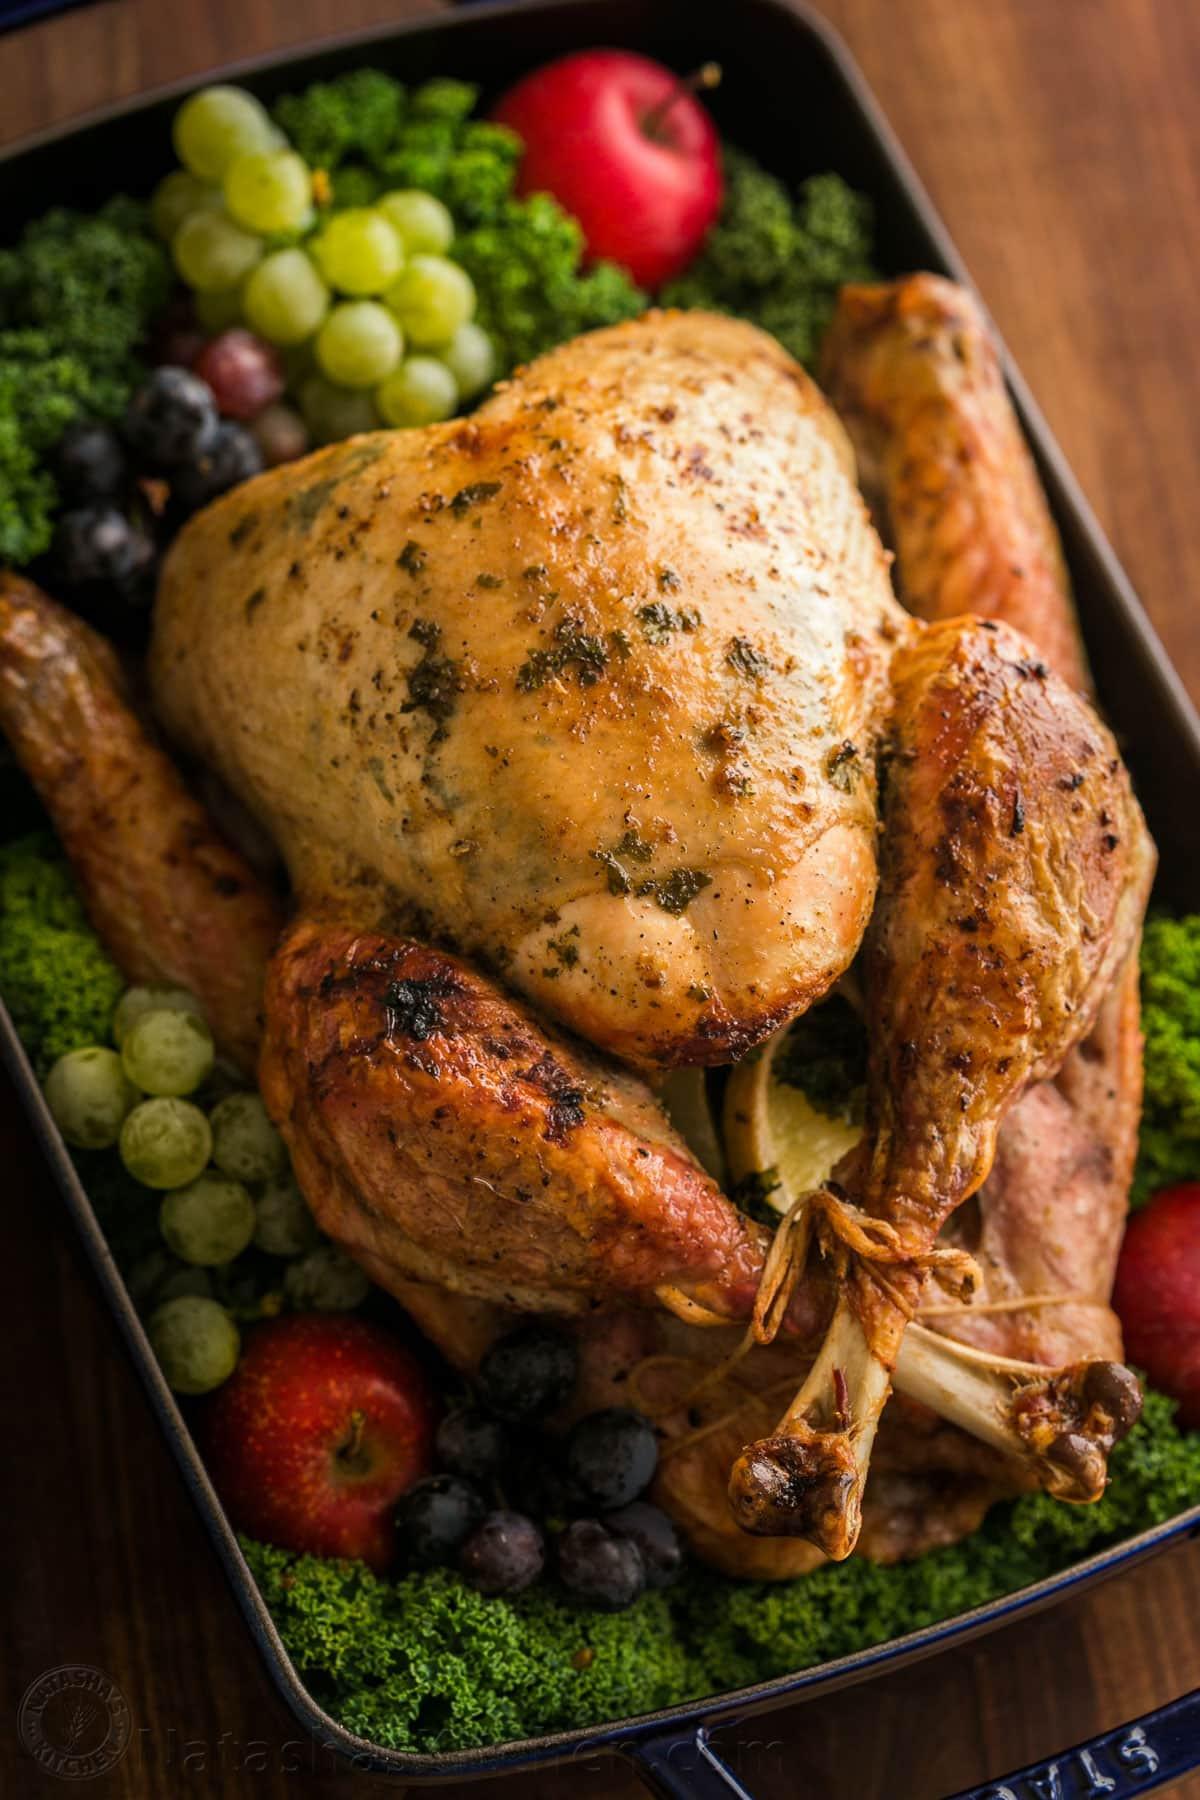 Pics Of Thanksgiving Turkey  Thanksgiving Turkey Recipe VIDEO NatashasKitchen